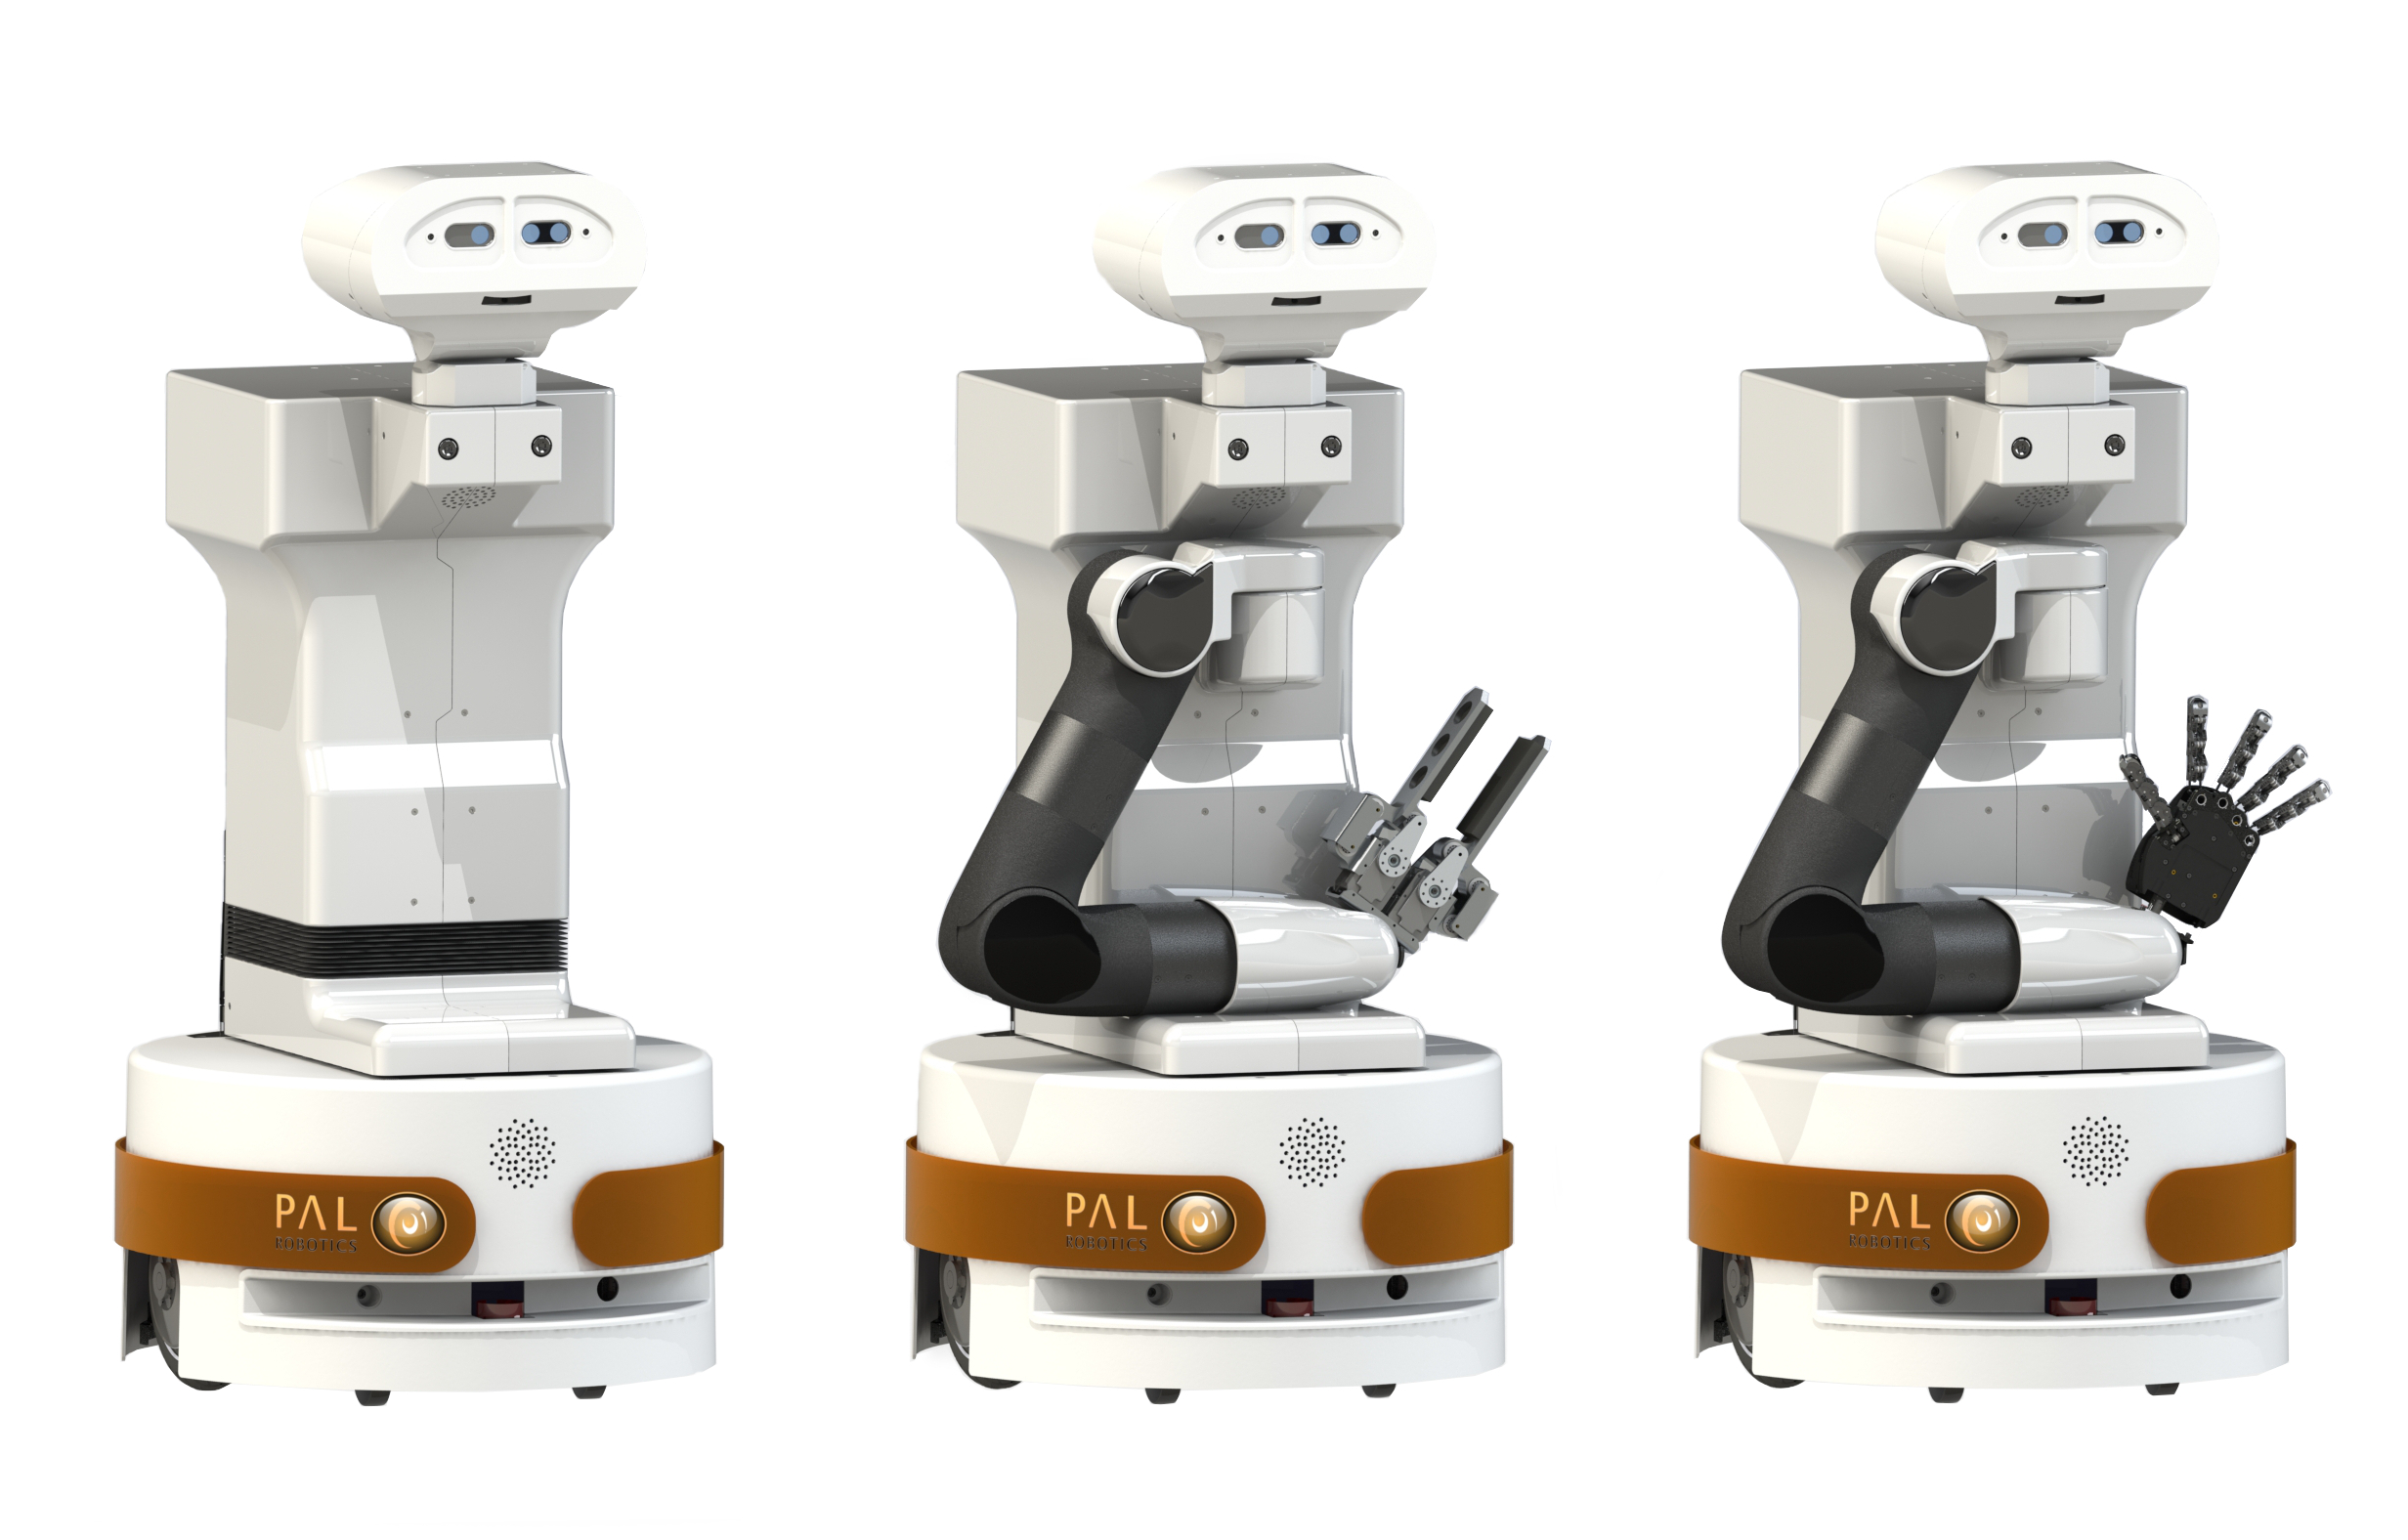 Mobile manipulator TIAGo. PAL Robotics.